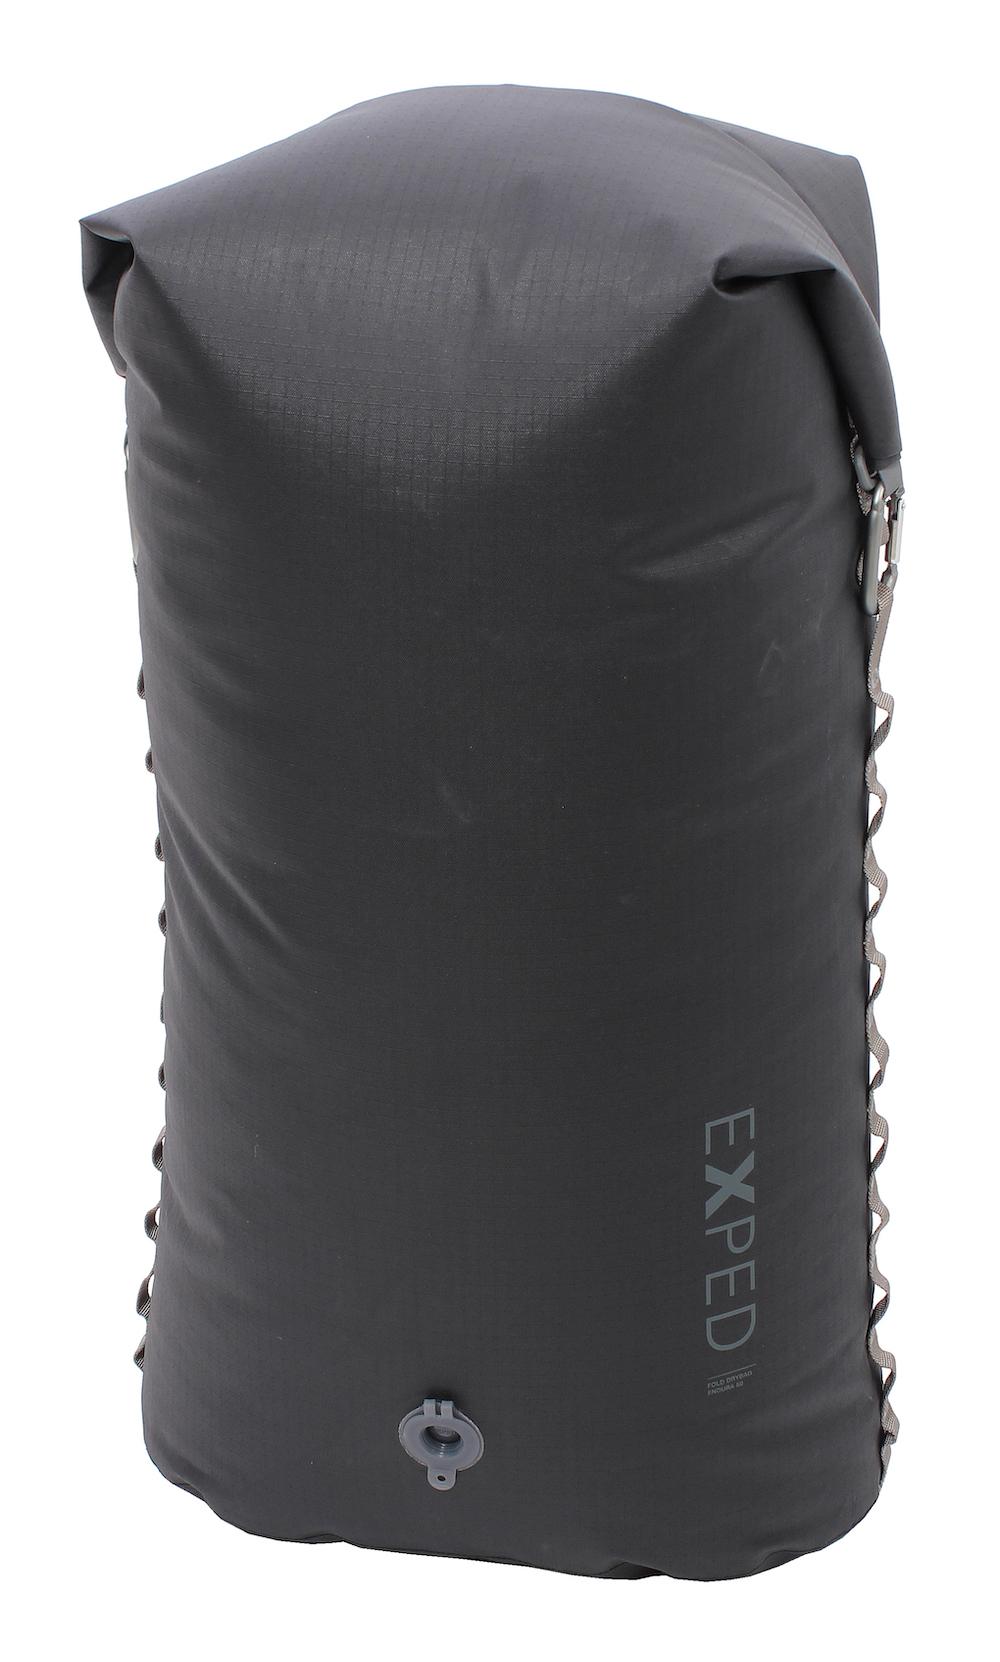 Exped - Fold Drybag Endura, Rollverschlusssack